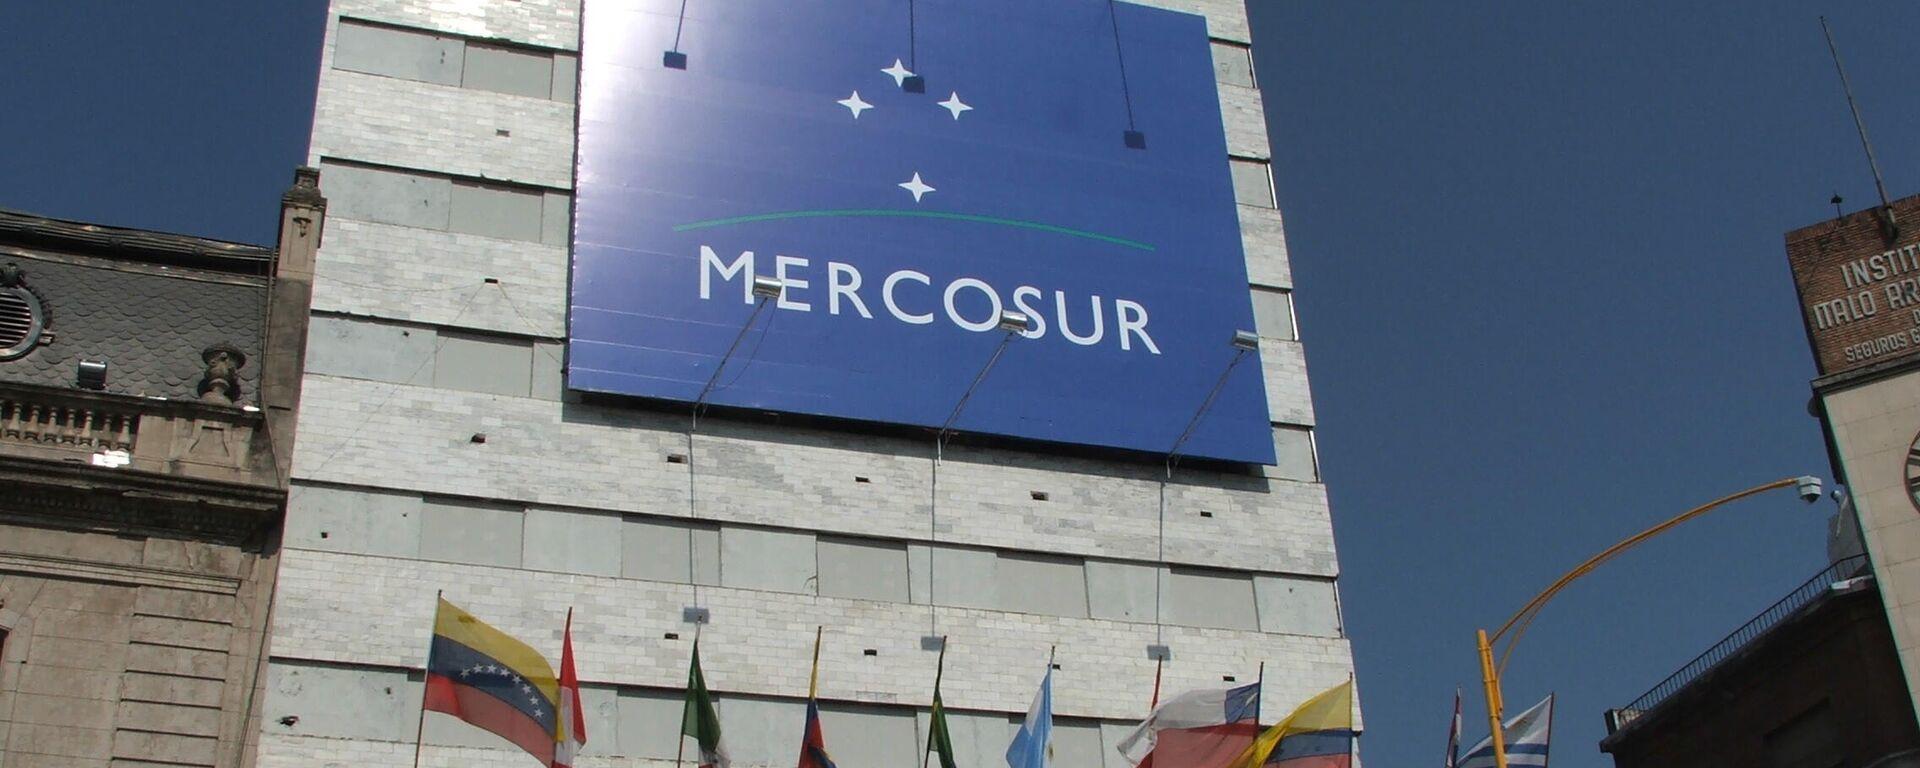 Mercosur - Sputnik Mundo, 1920, 17.09.2021